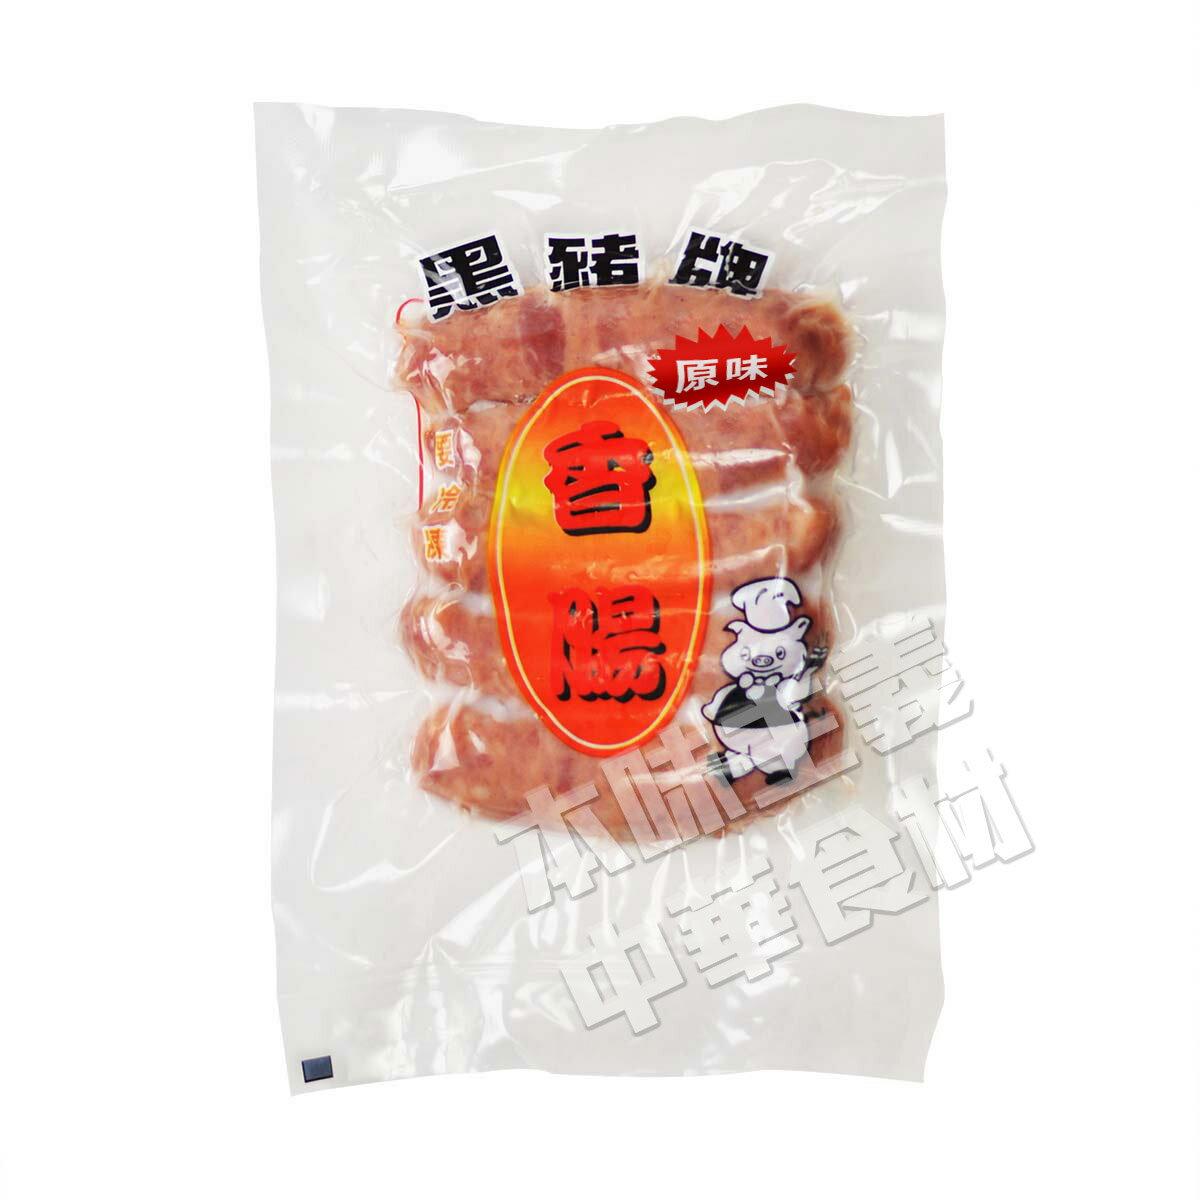 10袋セット送料込 台湾ソーセージ・腸詰・香腸 台湾風味・台湾料理・中華食材・お土産定番No.50613*10